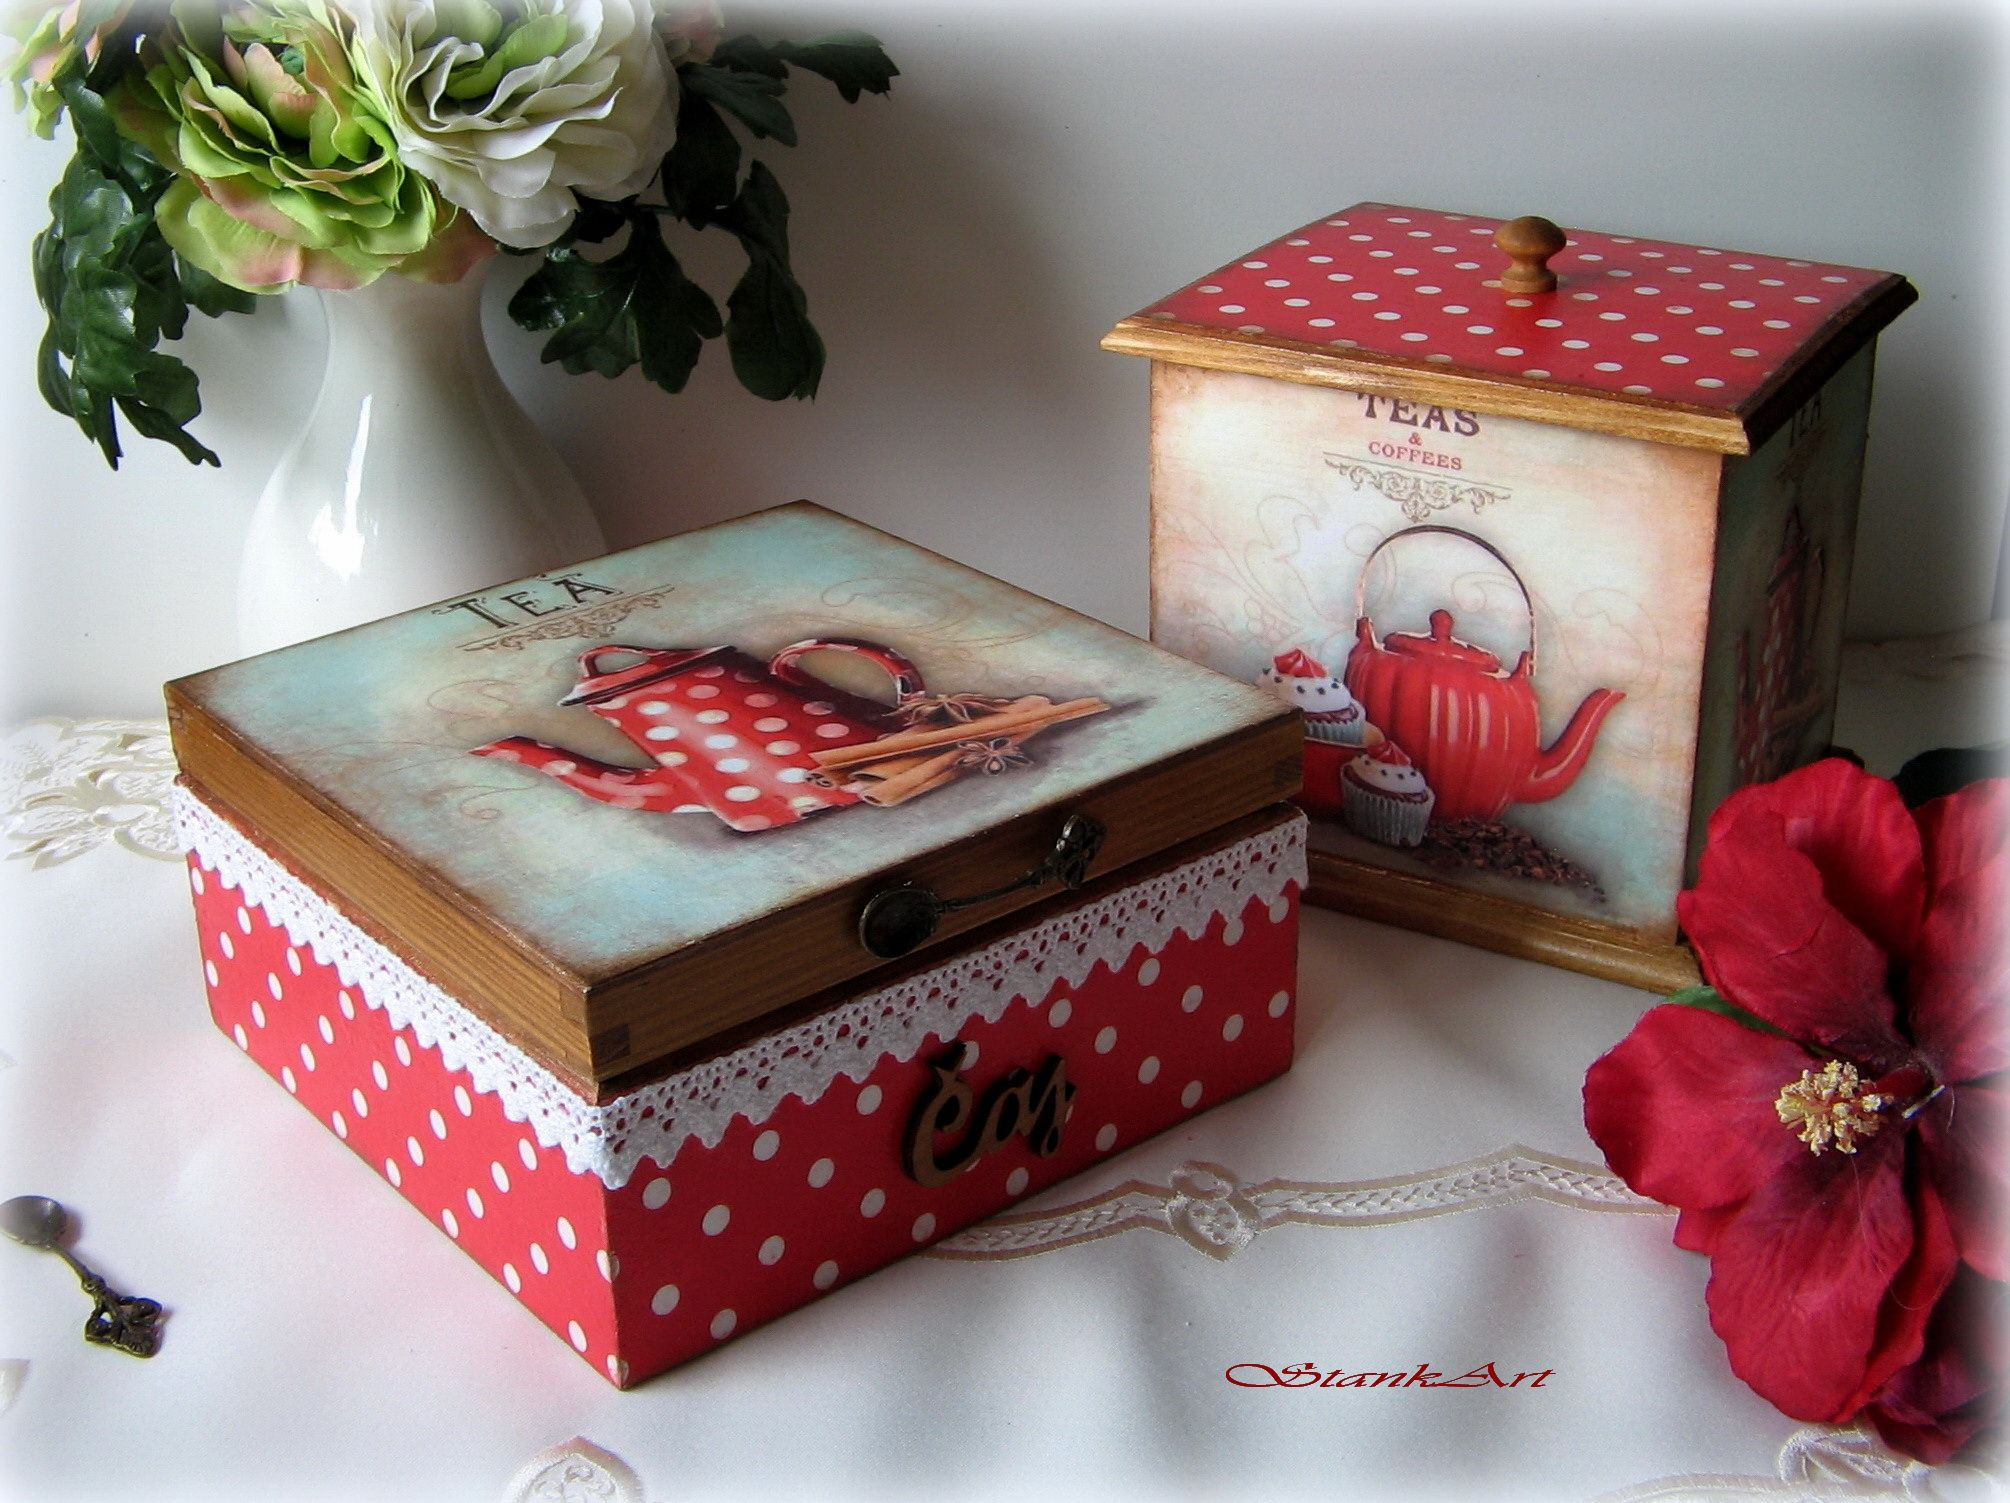 задний бампер картинки для чайной коробки искал